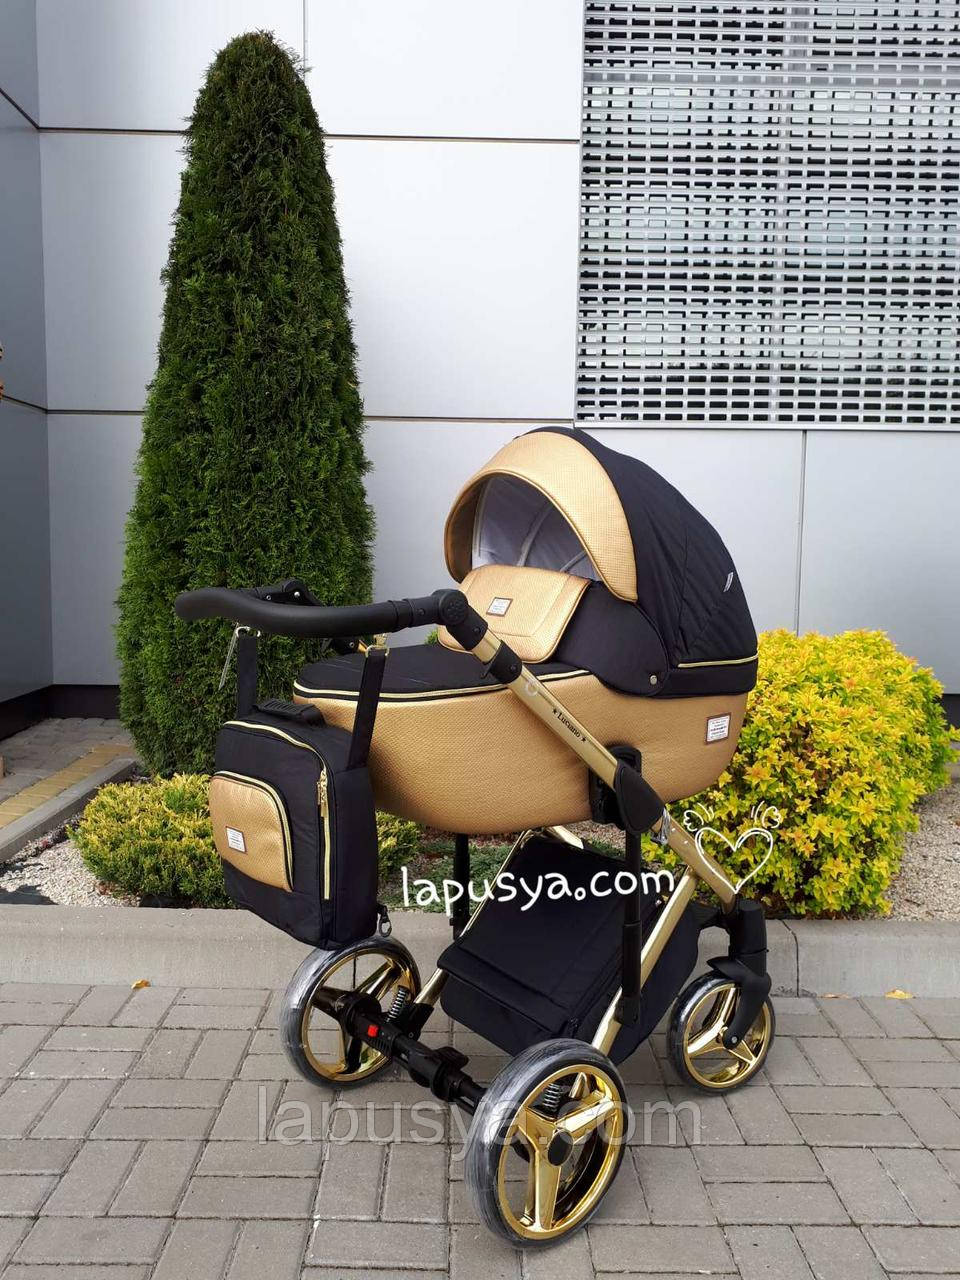 Дитяча універсальна коляска 2 в 1 Adamex Luciano PolarGold